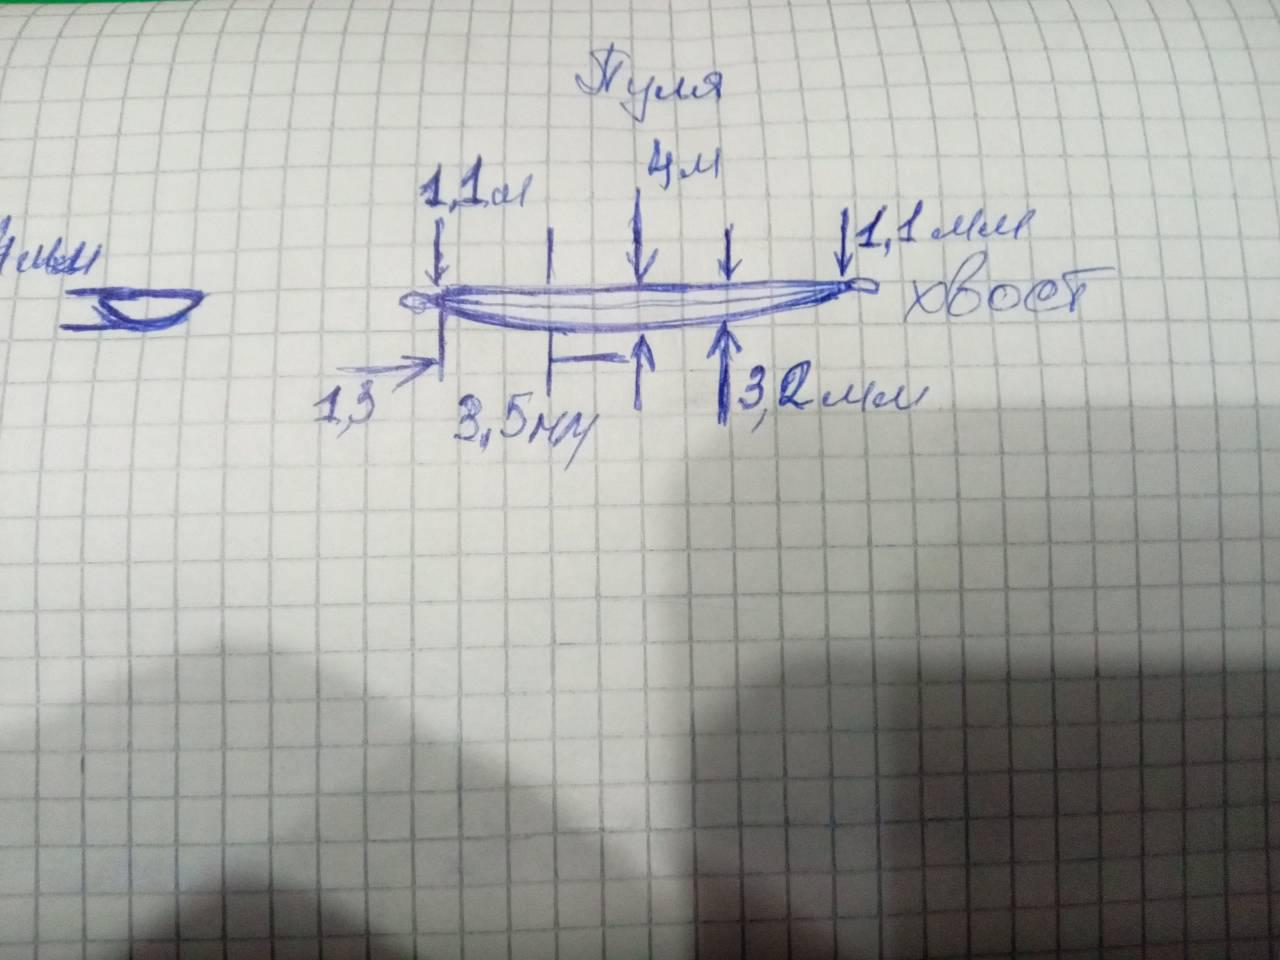 5fdcec23b8cd91991ccda0bf.jpg